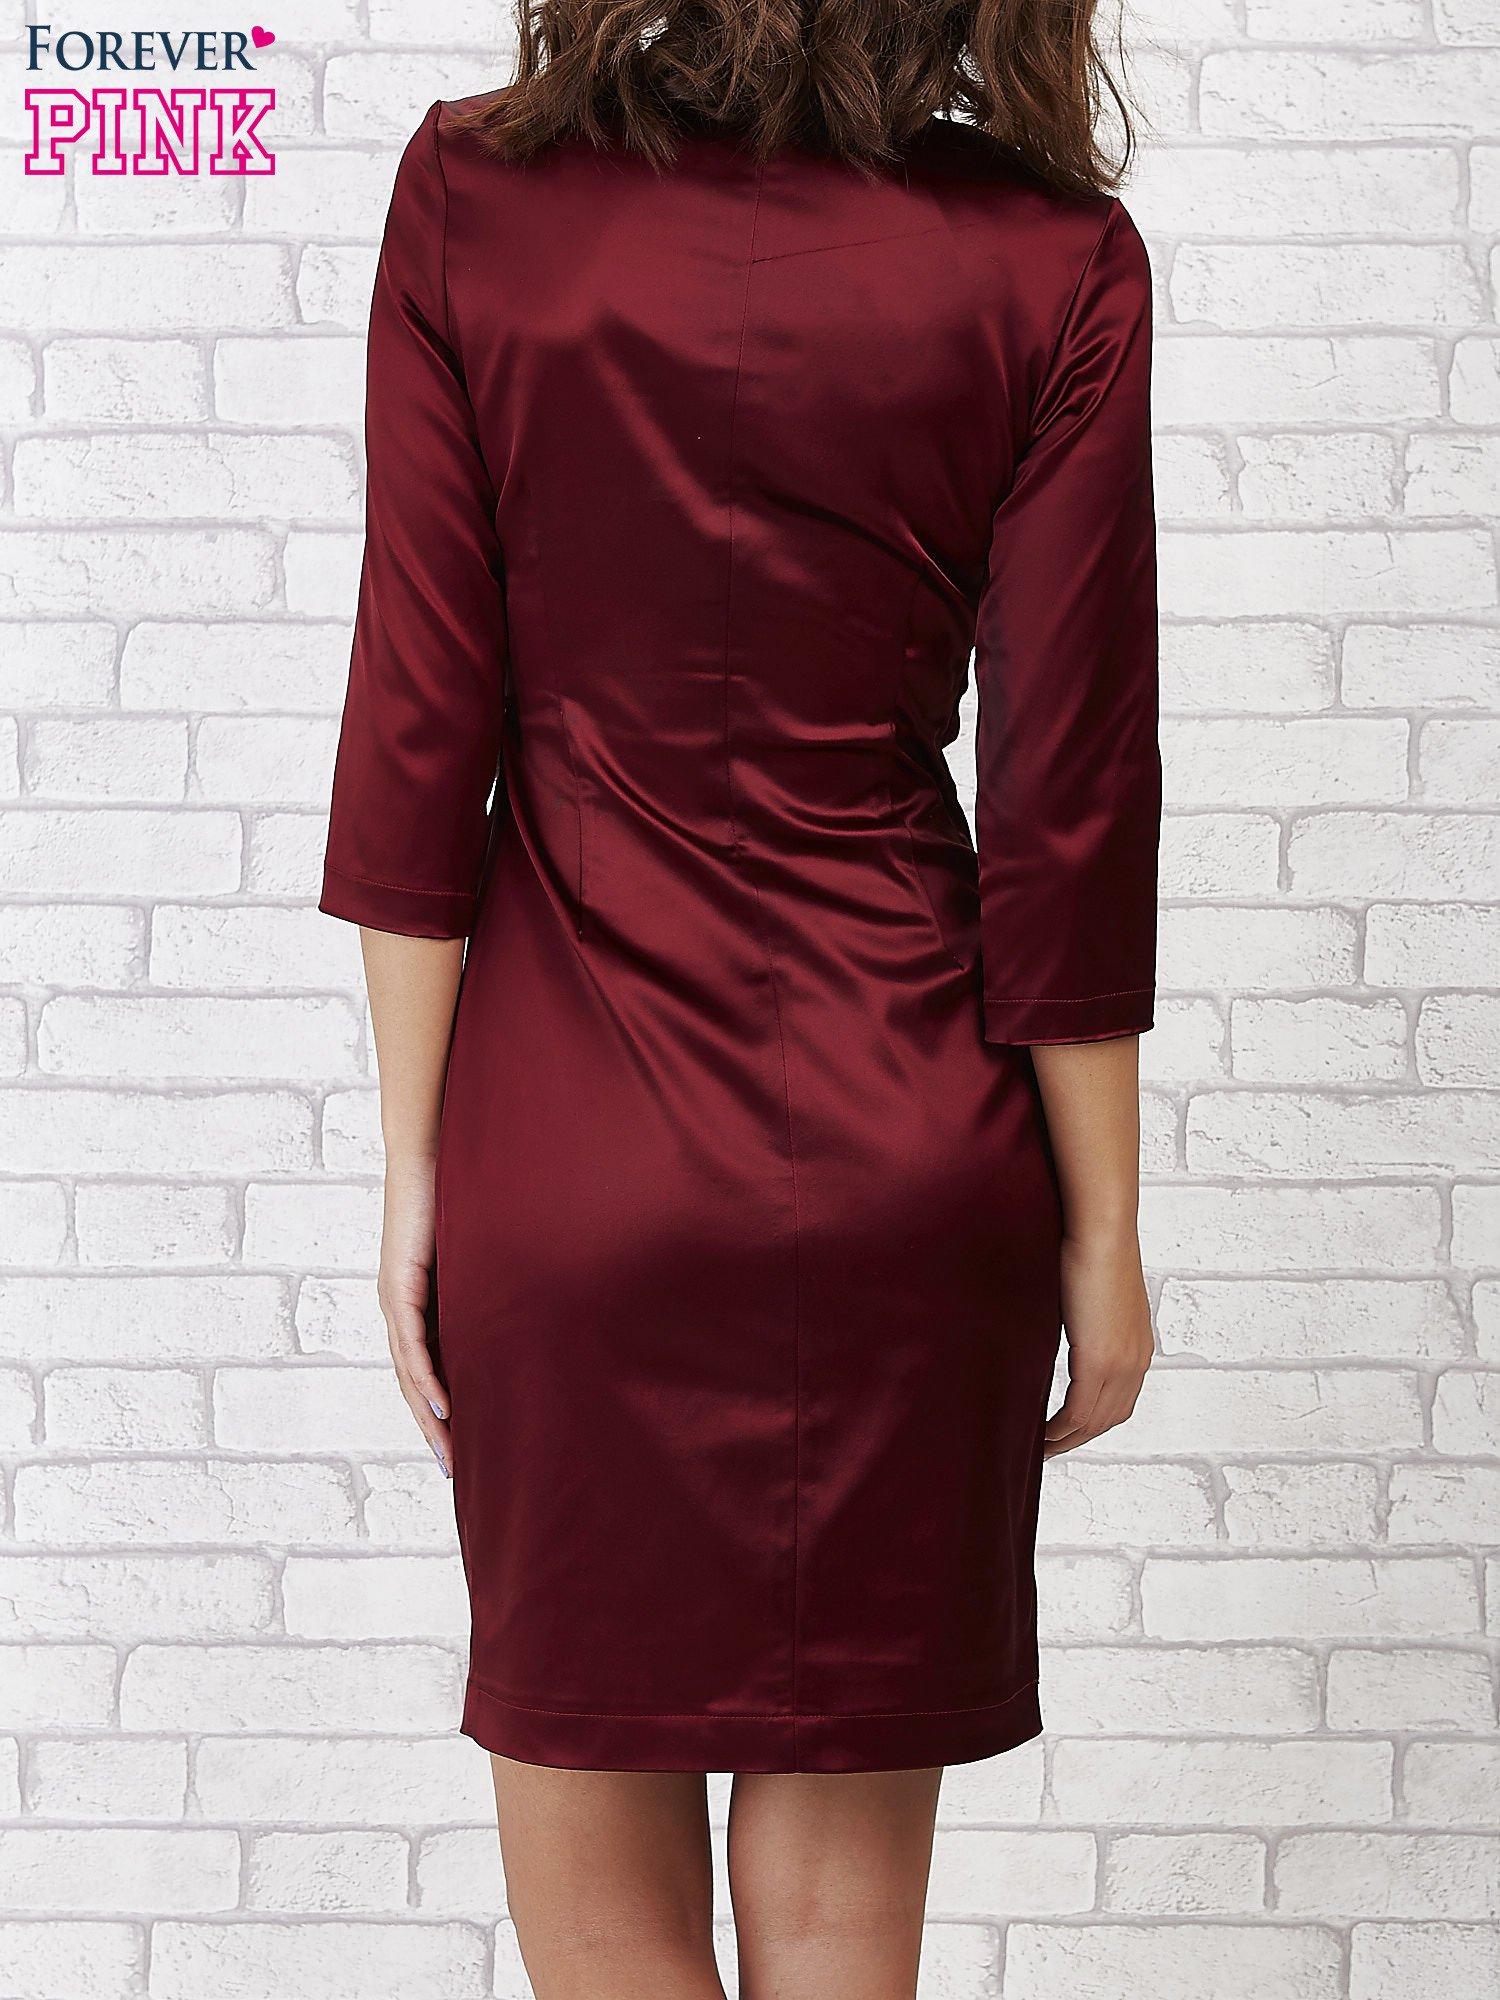 Bordowa sukienka ze srebrną kokardą                                   zdj.                                  3